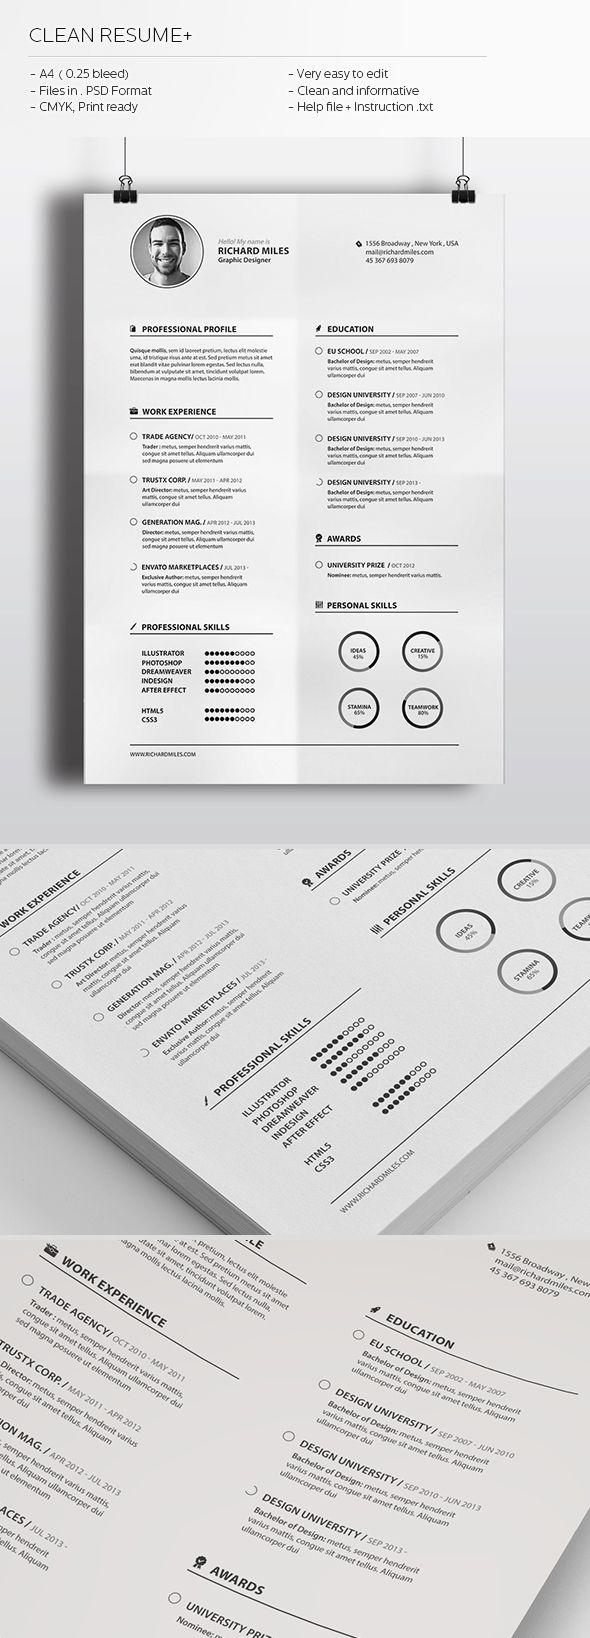 Clean Resume+ by Realstar , via Behance